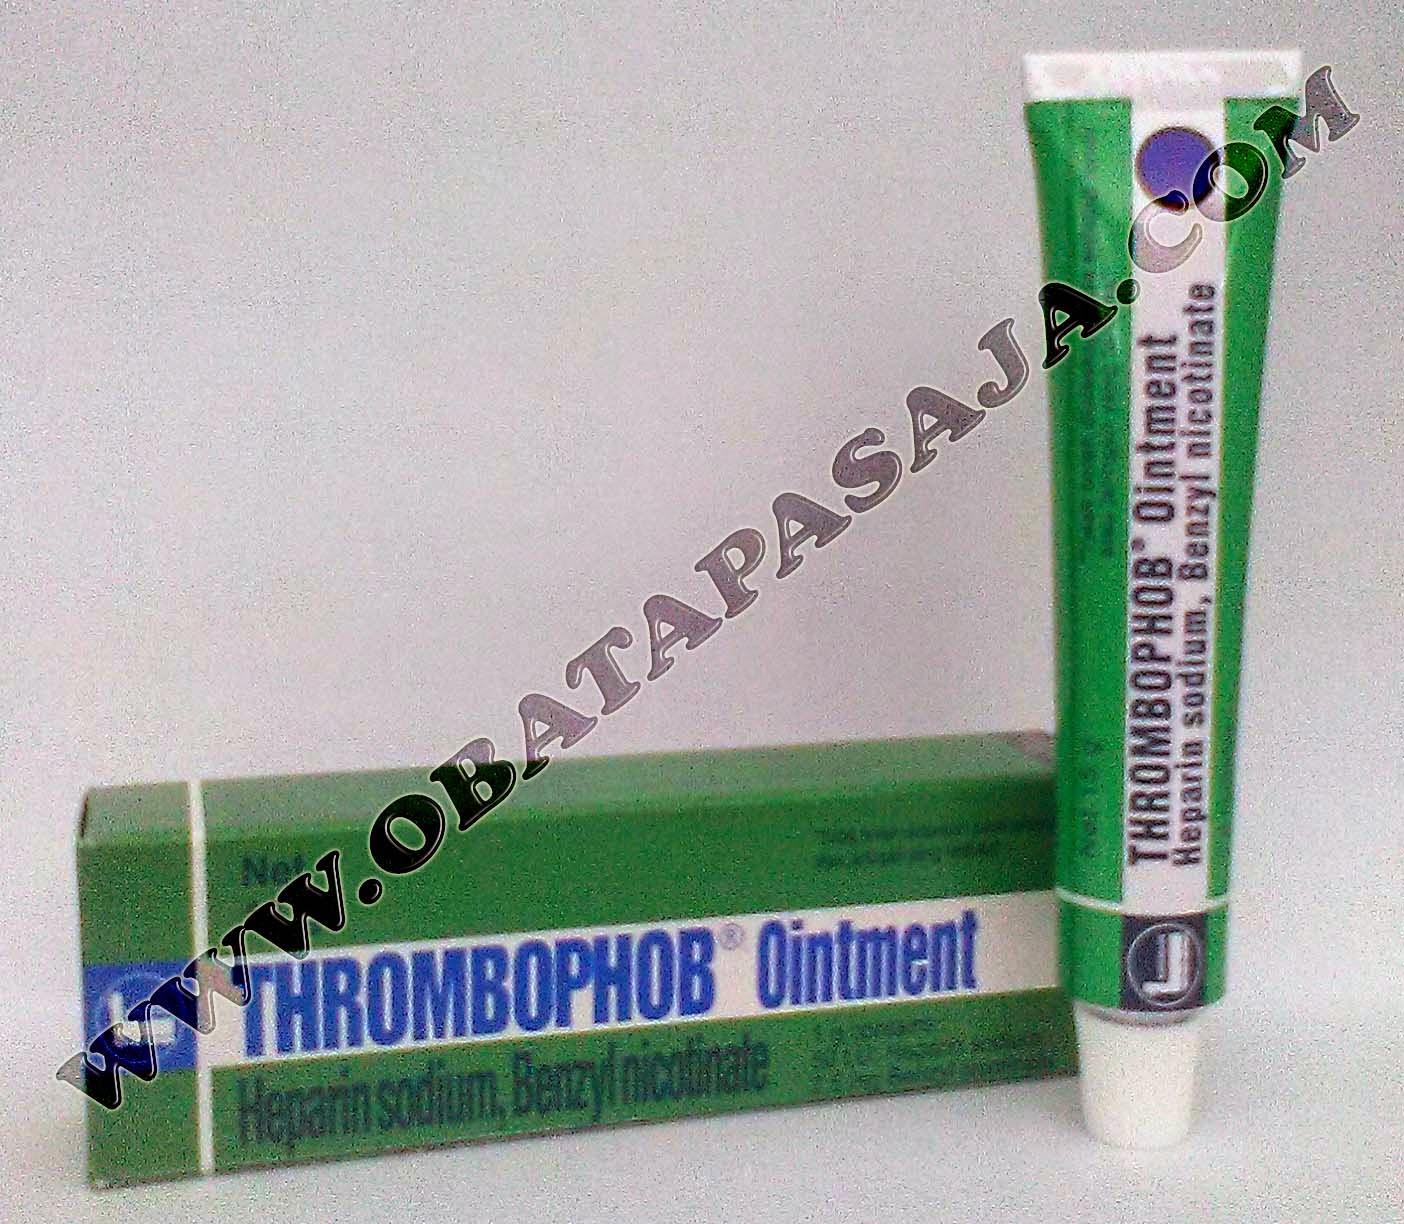 Komposisi  Harga dan Cara Pemakaian Thrombophob Ointment (Salep)